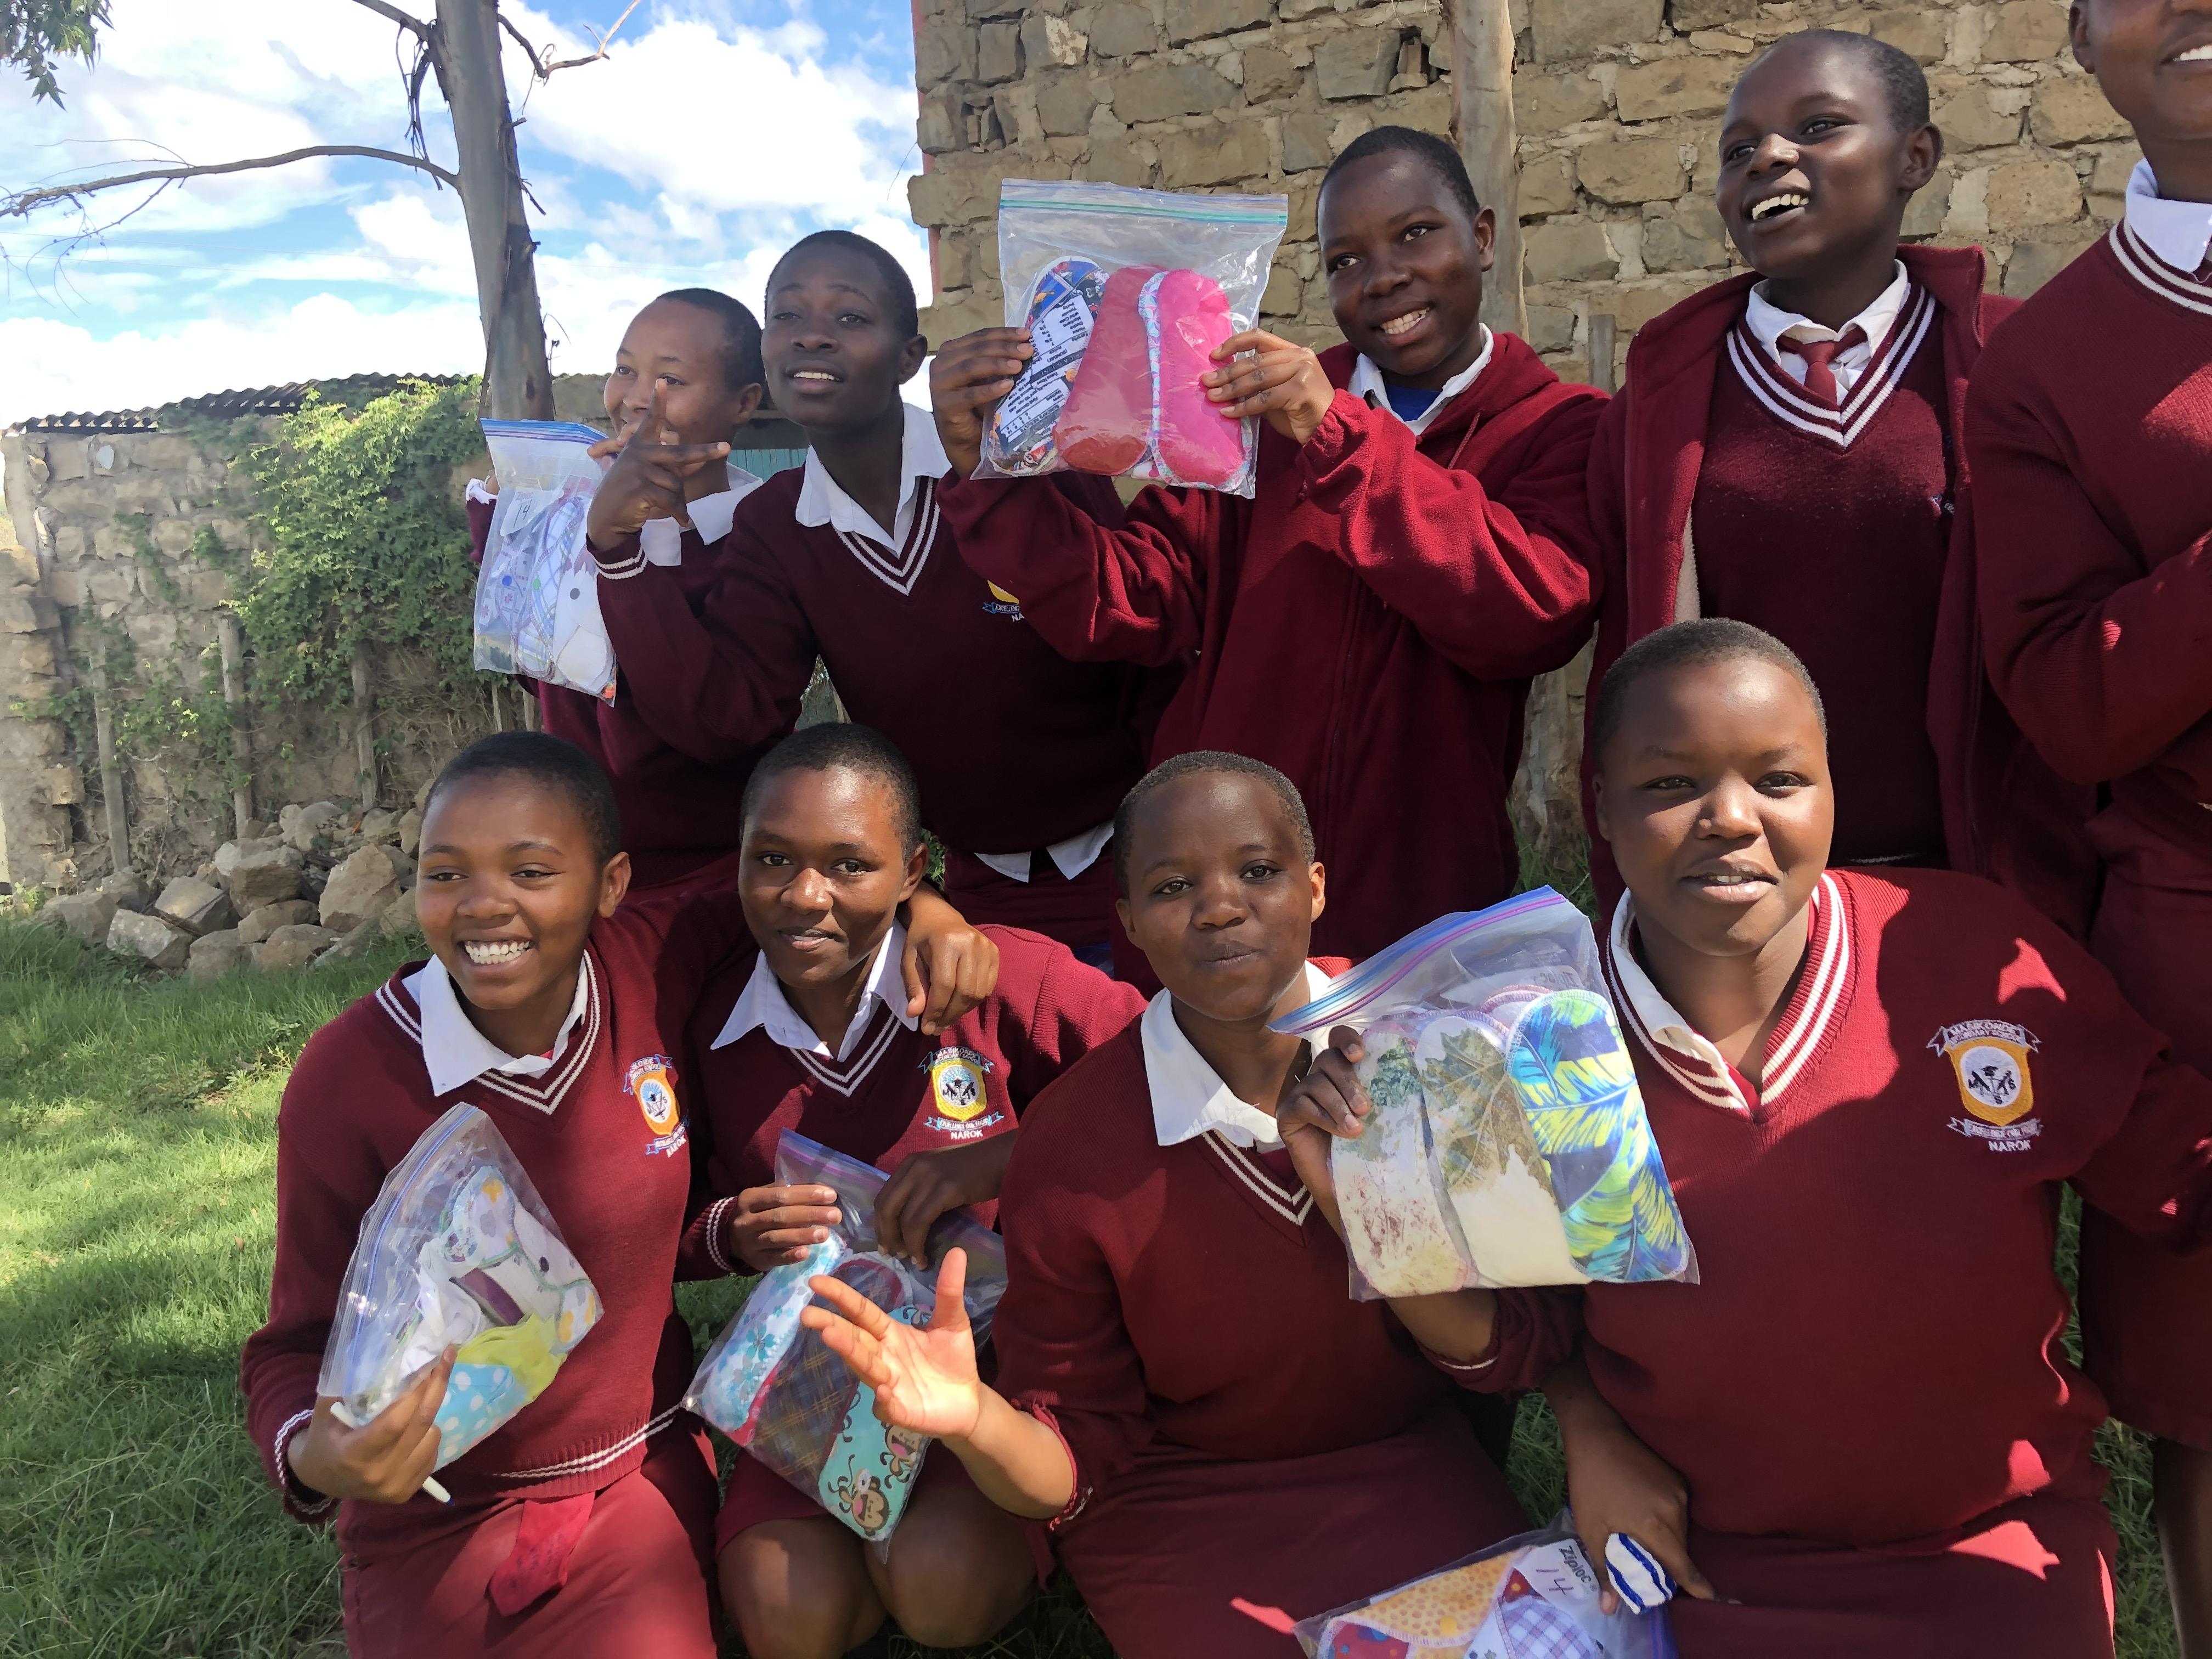 Menstrual shame hurts Kenyan girls; sanitary products offer hope